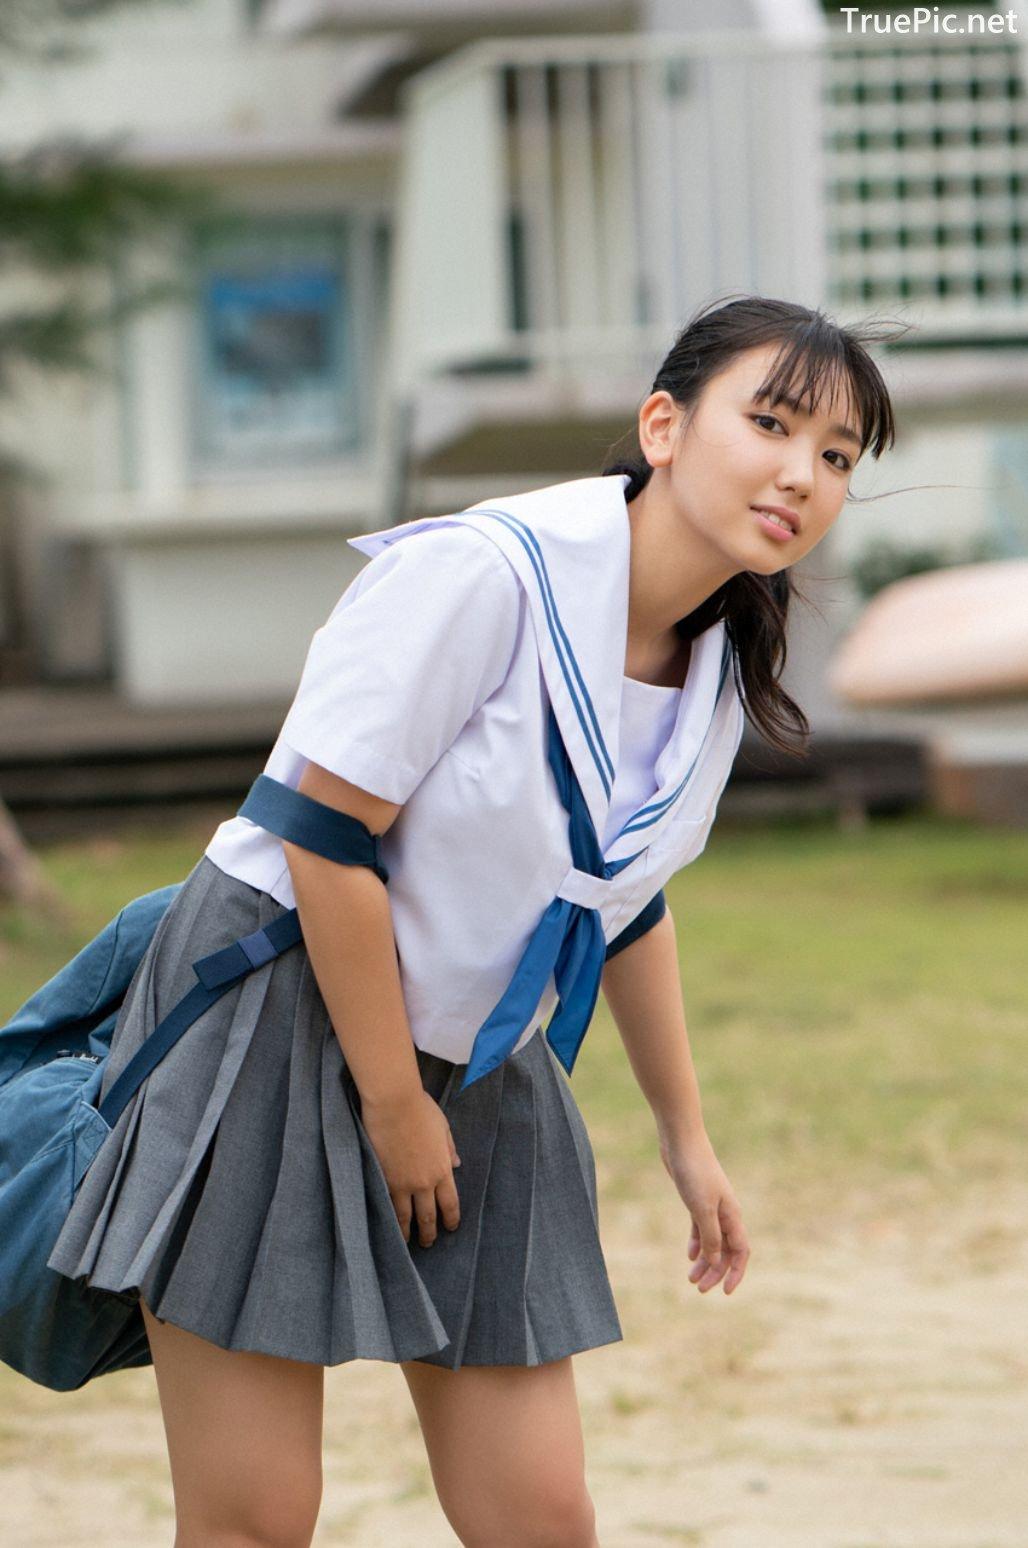 Image-Japanese-Pop-Idol-Aika-Sawaguchi-Champion-Road-TruePic.net- Picture-3